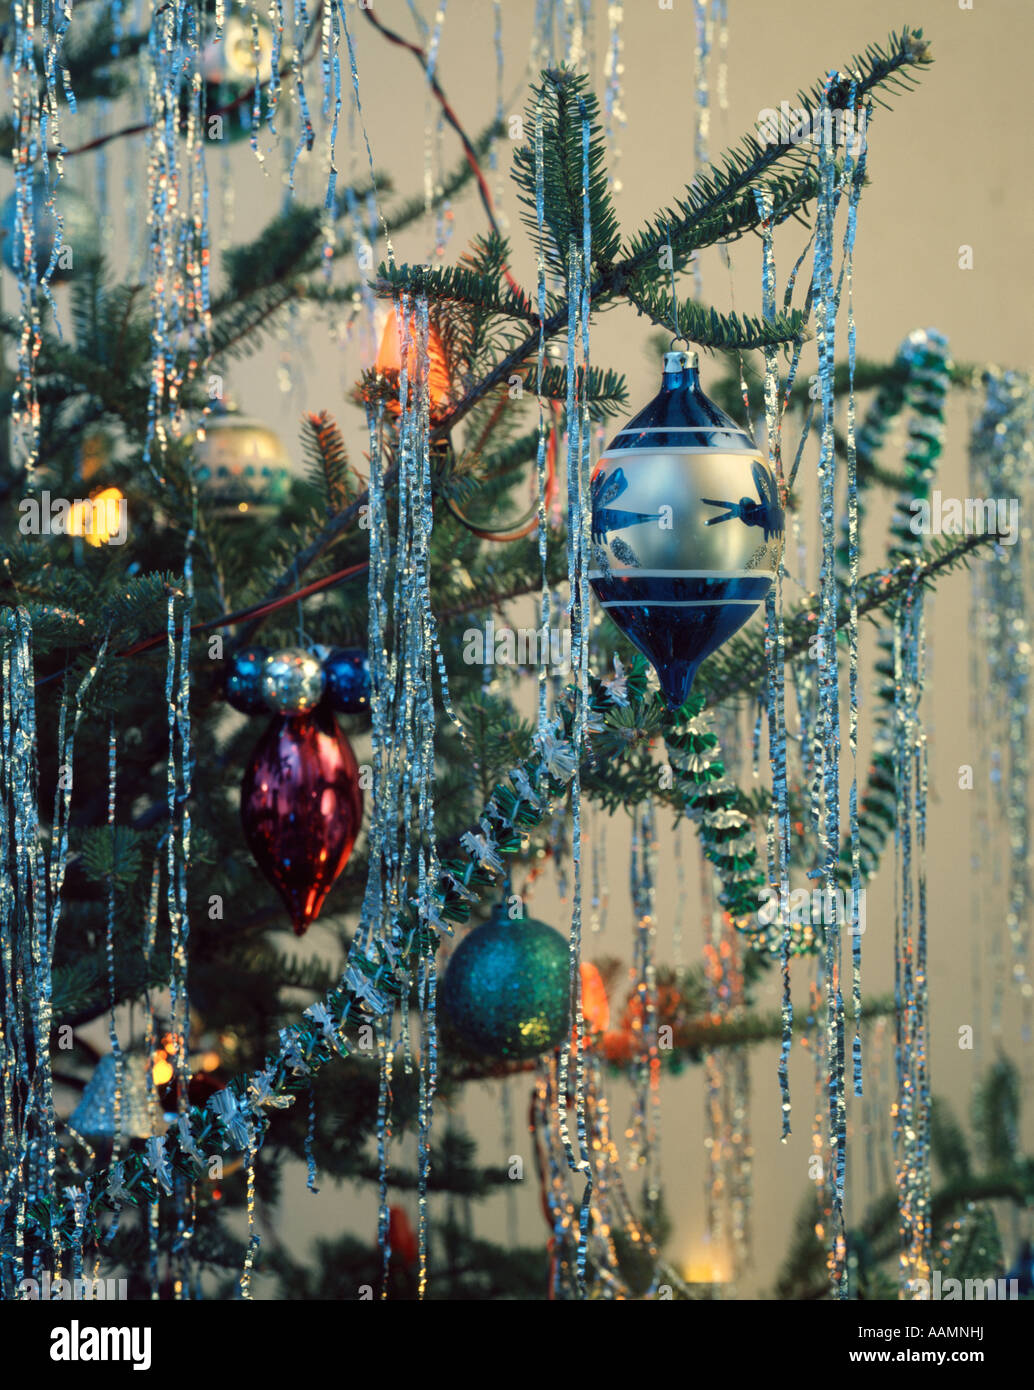 Vintage christmas tree ornaments - 1970 1970s Retro Christmas Tree Ornament Garland Lights Stock Image